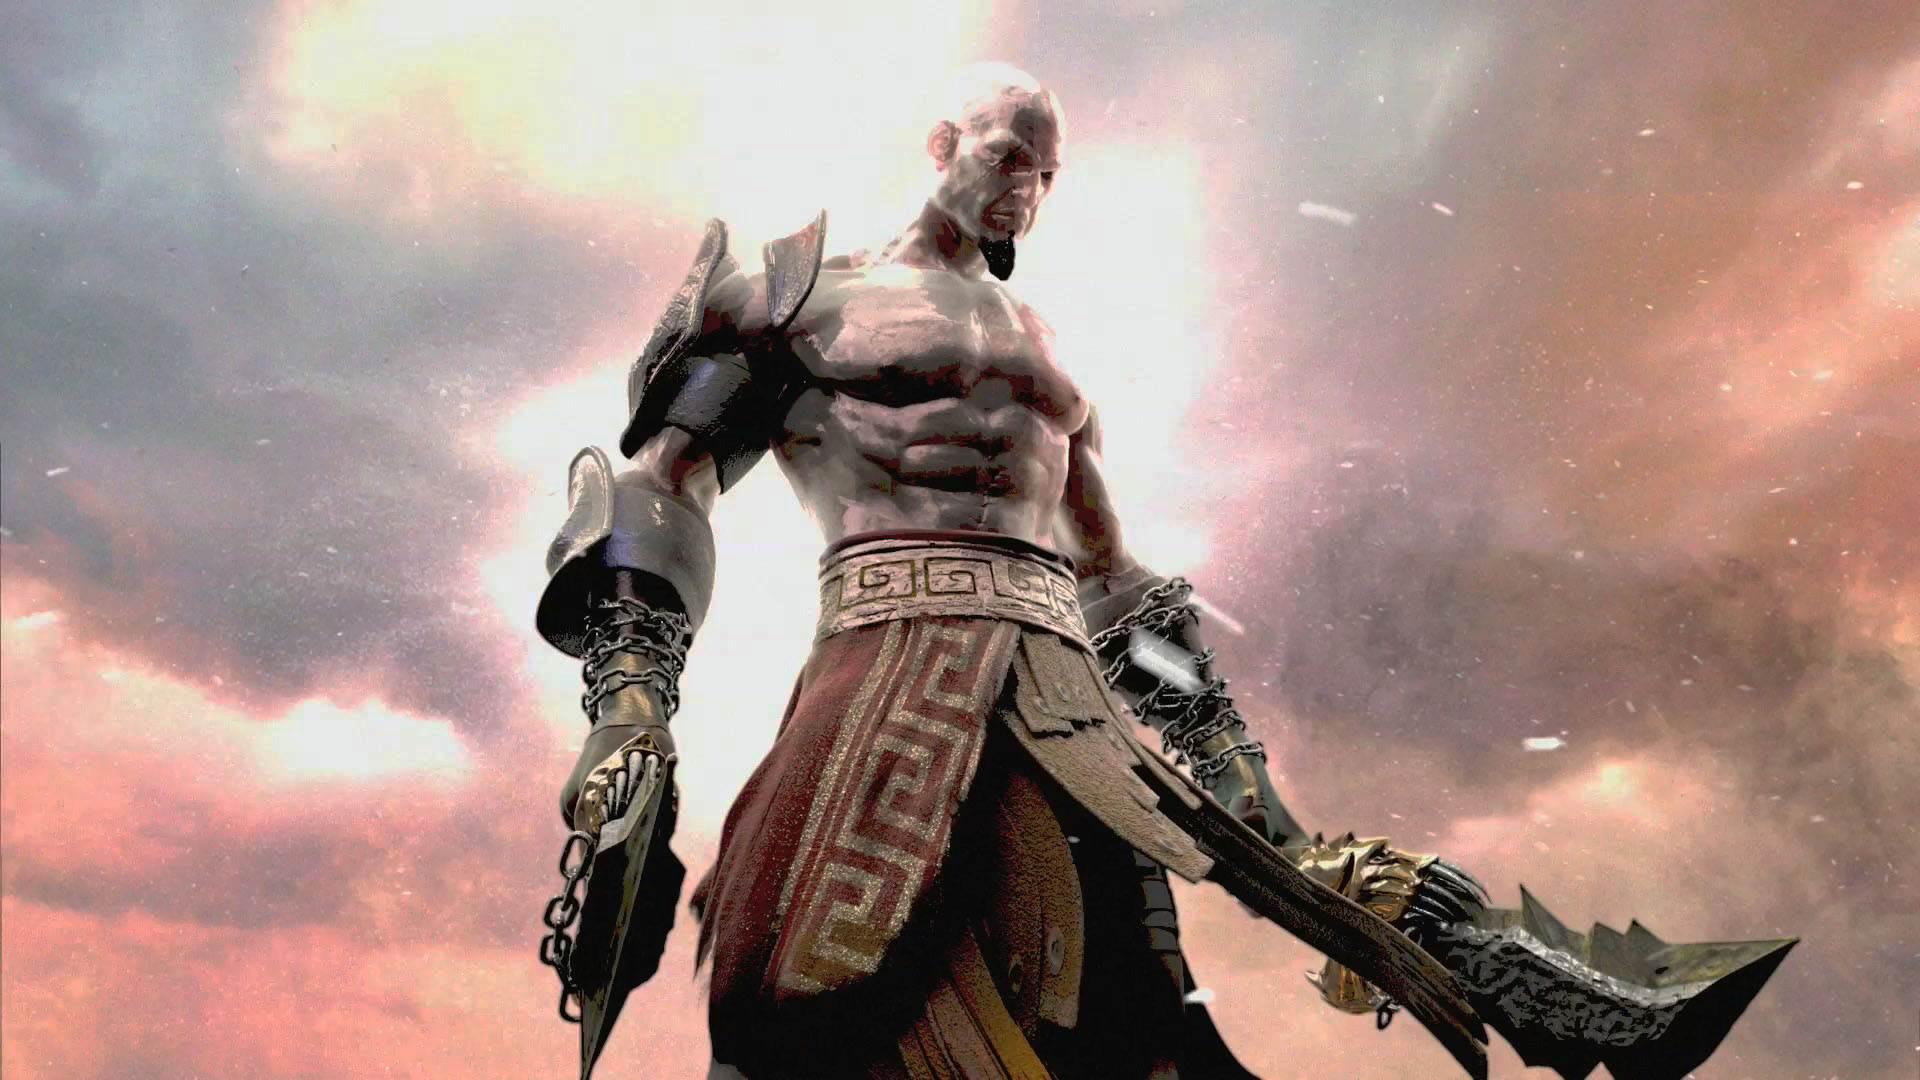 Kratos hd wallpapers 45 wallpapers adorable wallpapers - Wallpaper kratos ...